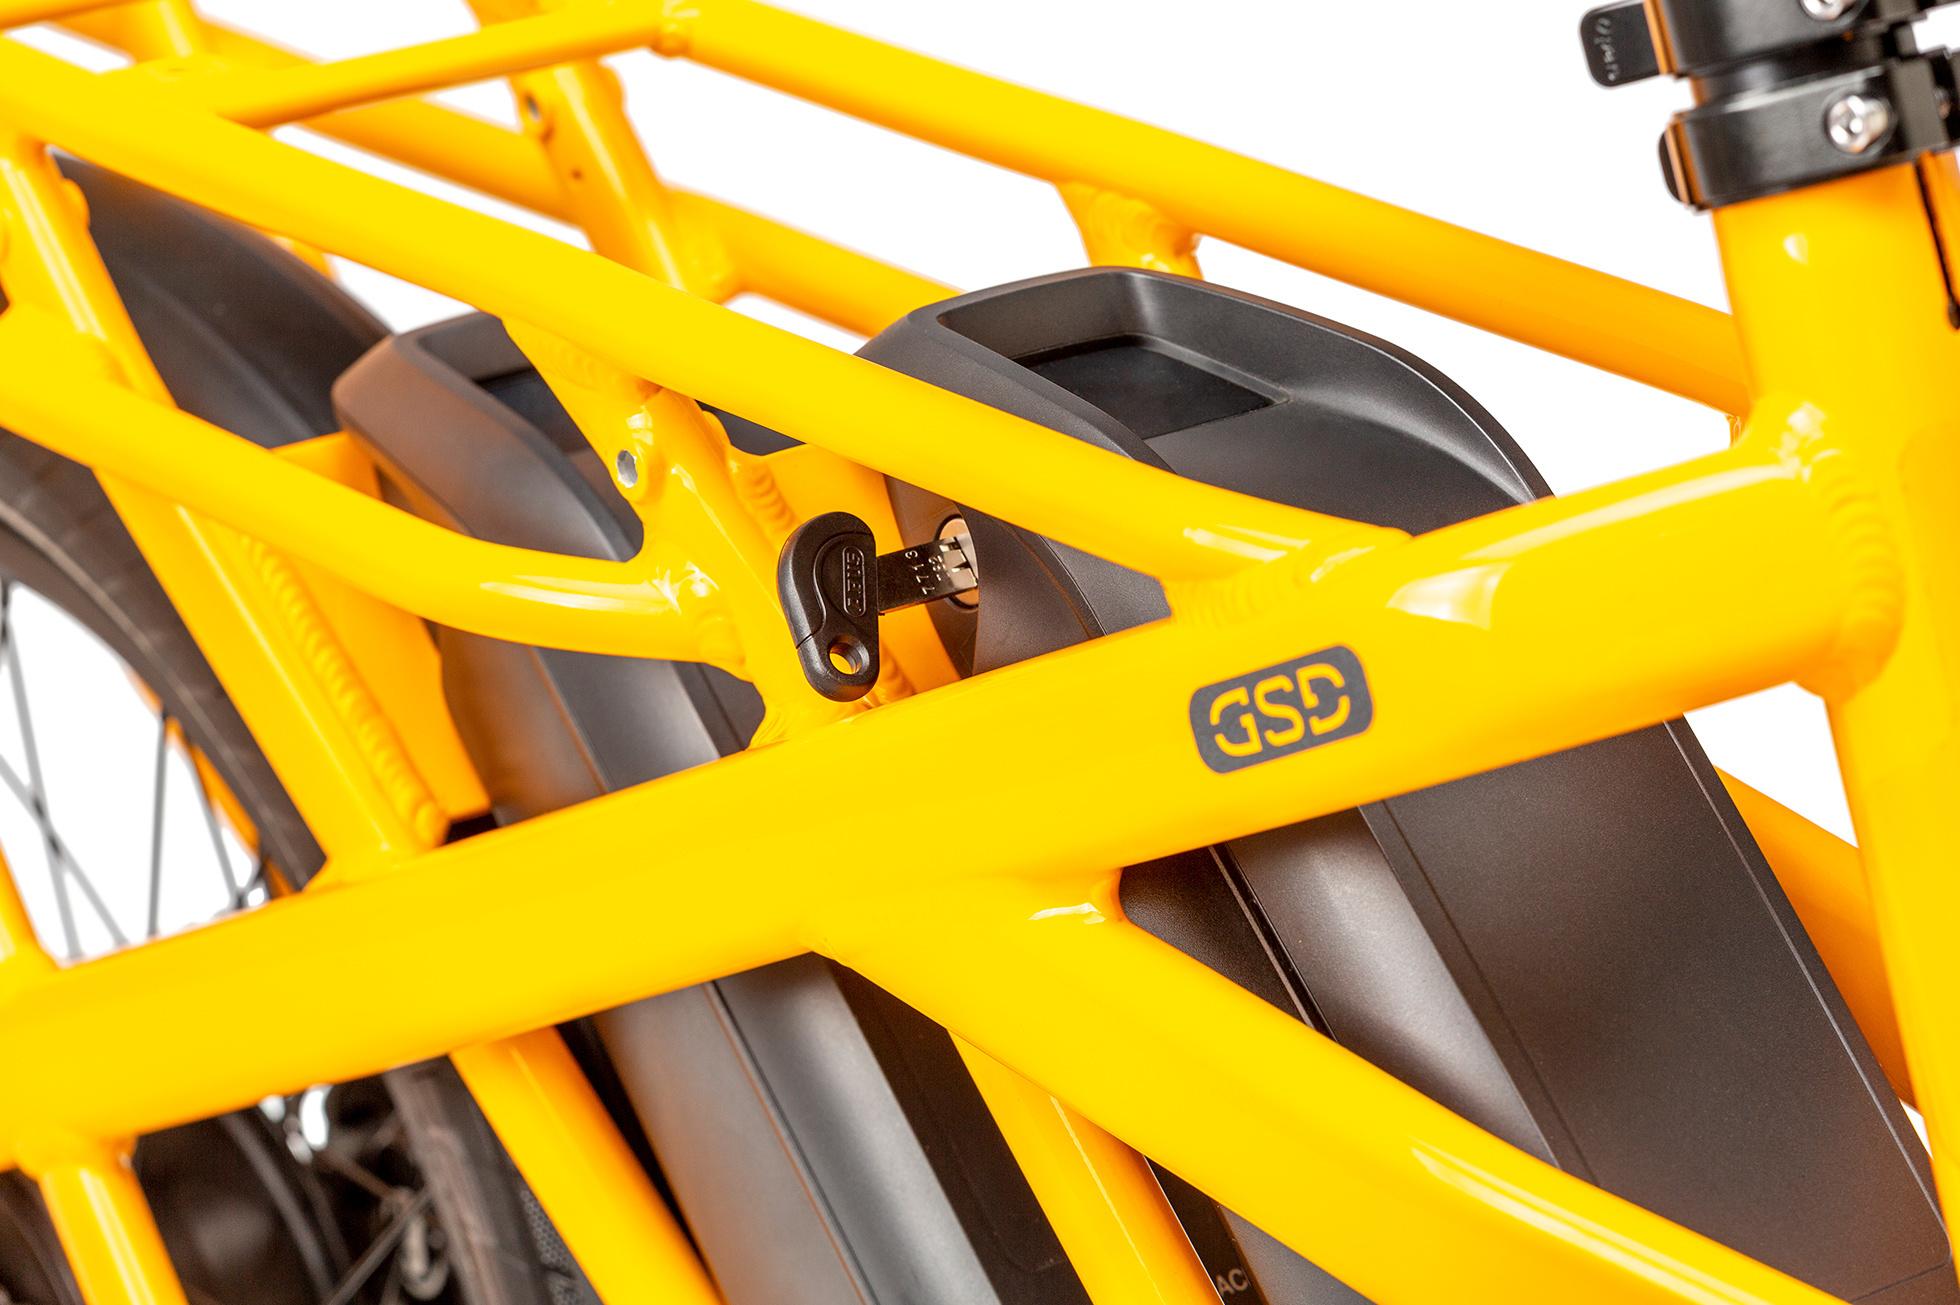 Tern GSD S00 Compact Cargo E-Bike